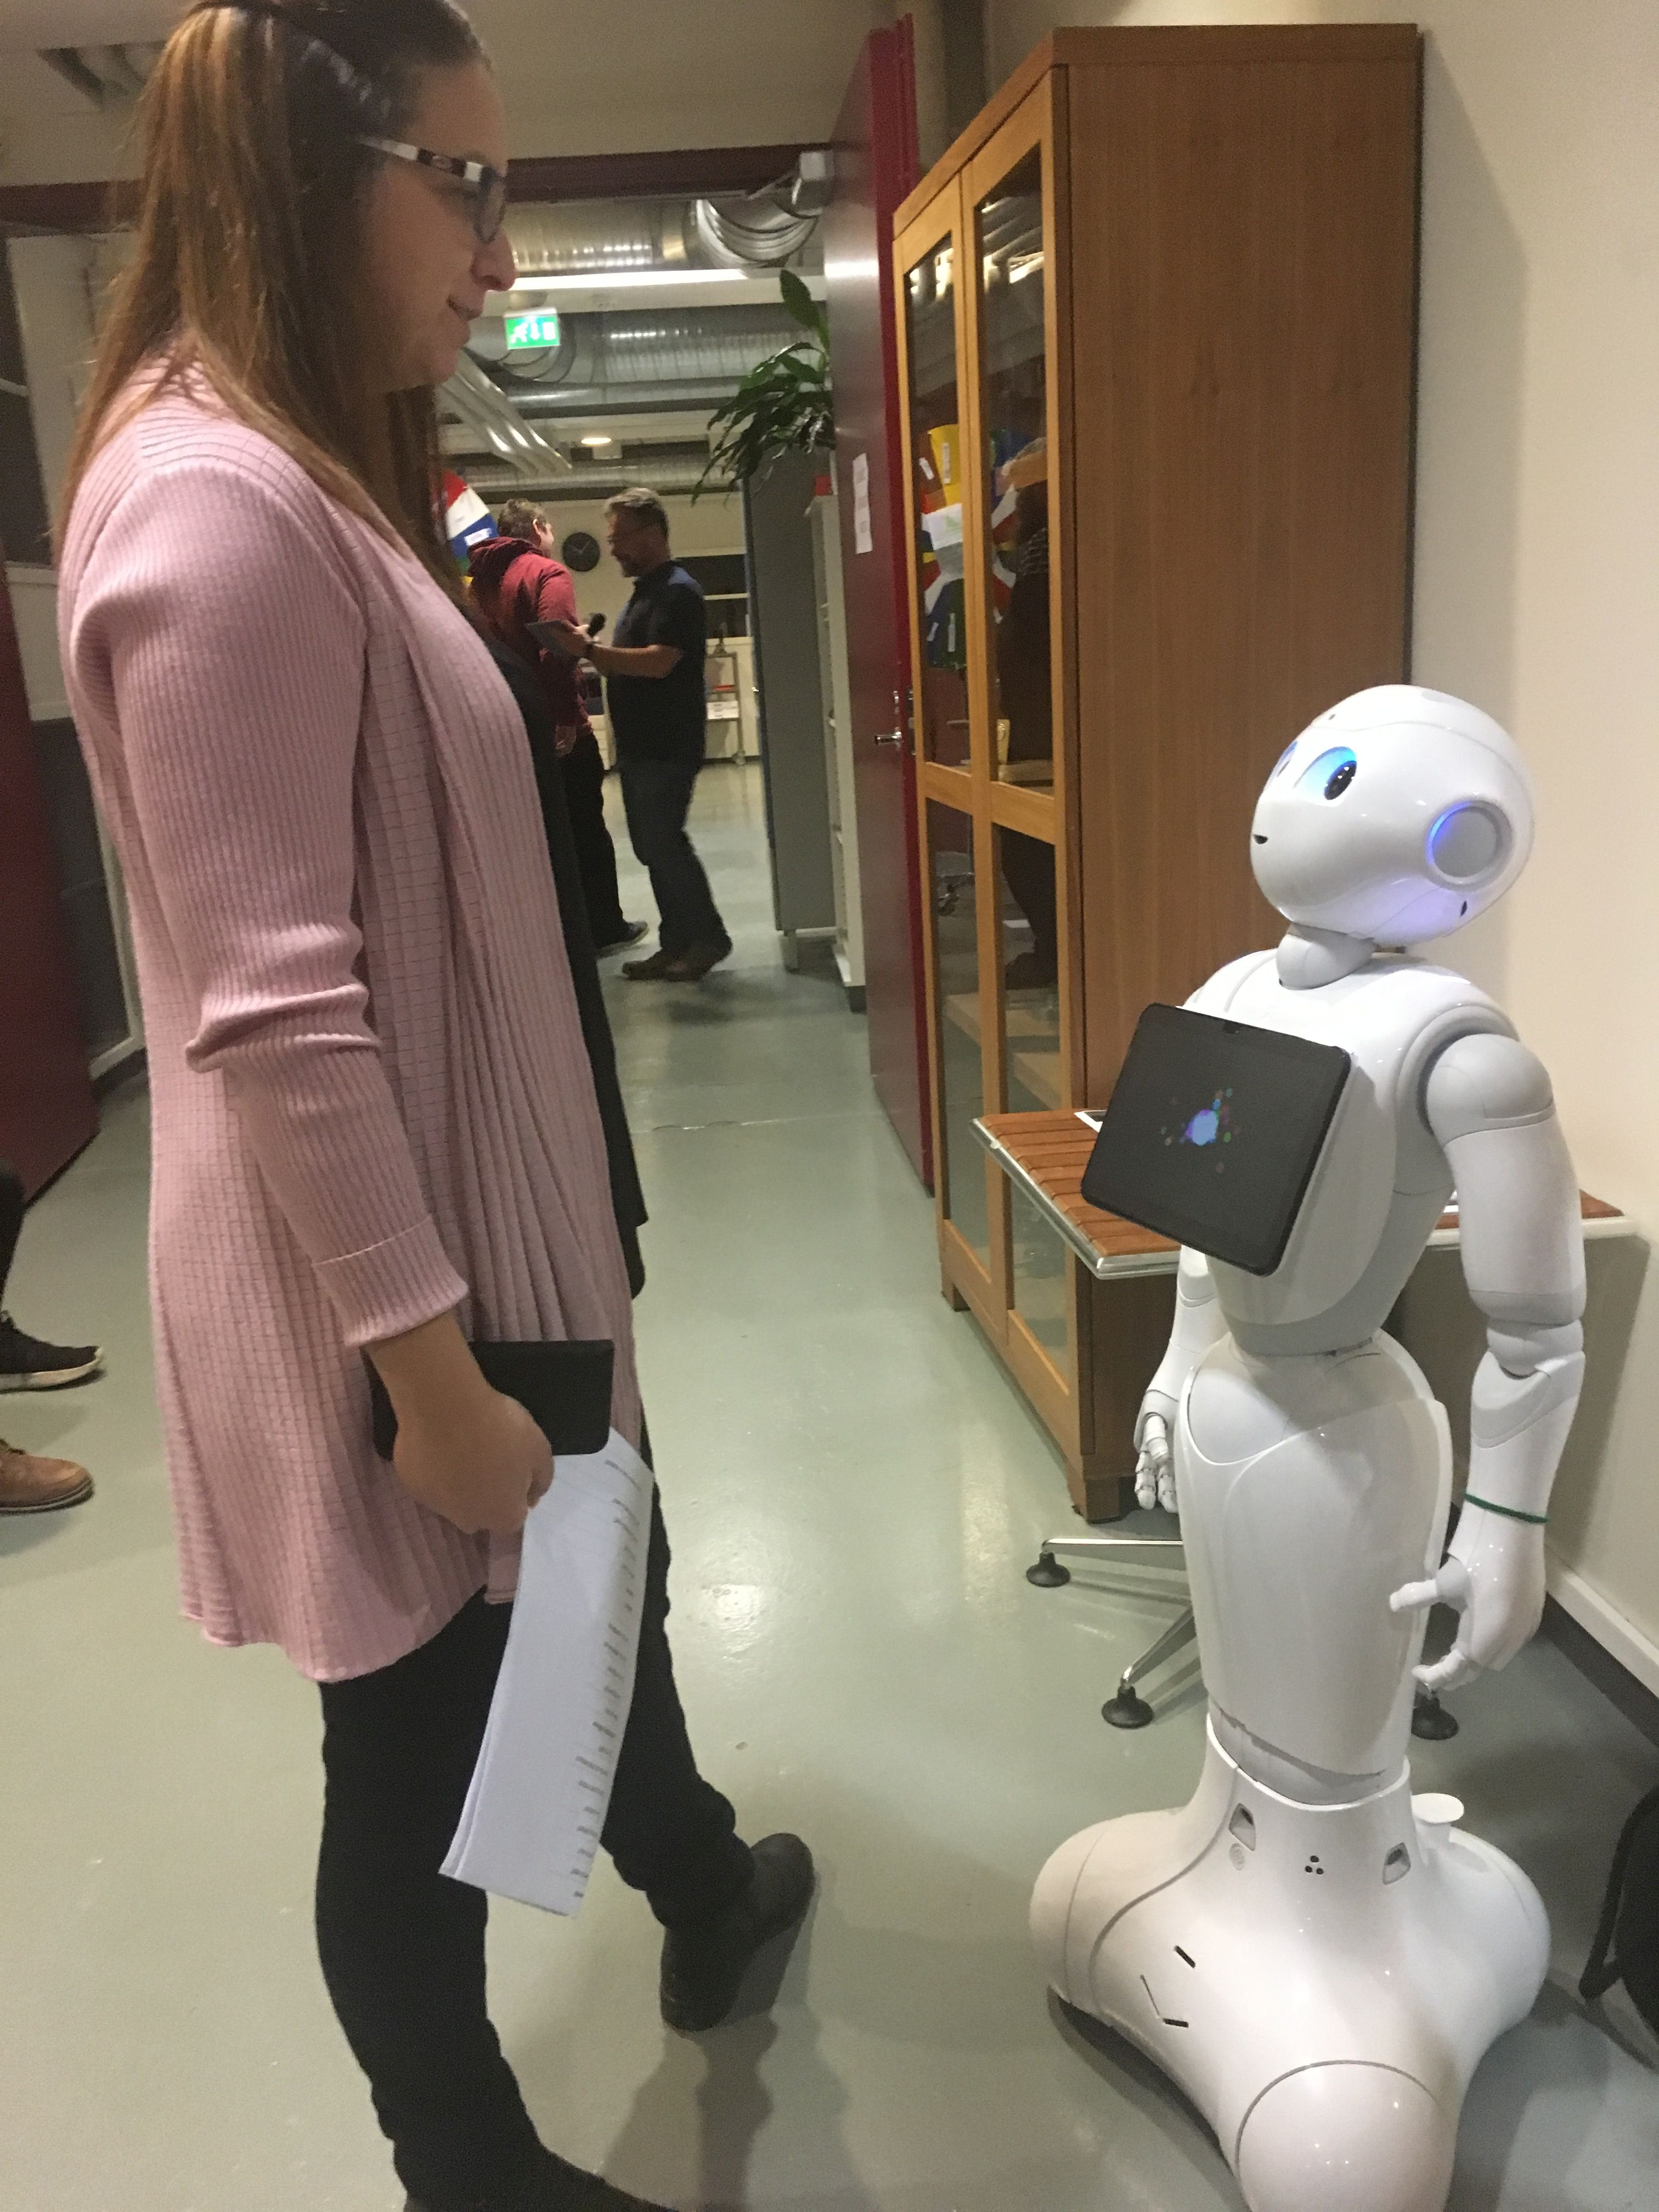 Pepper robotti jutusteli englantia